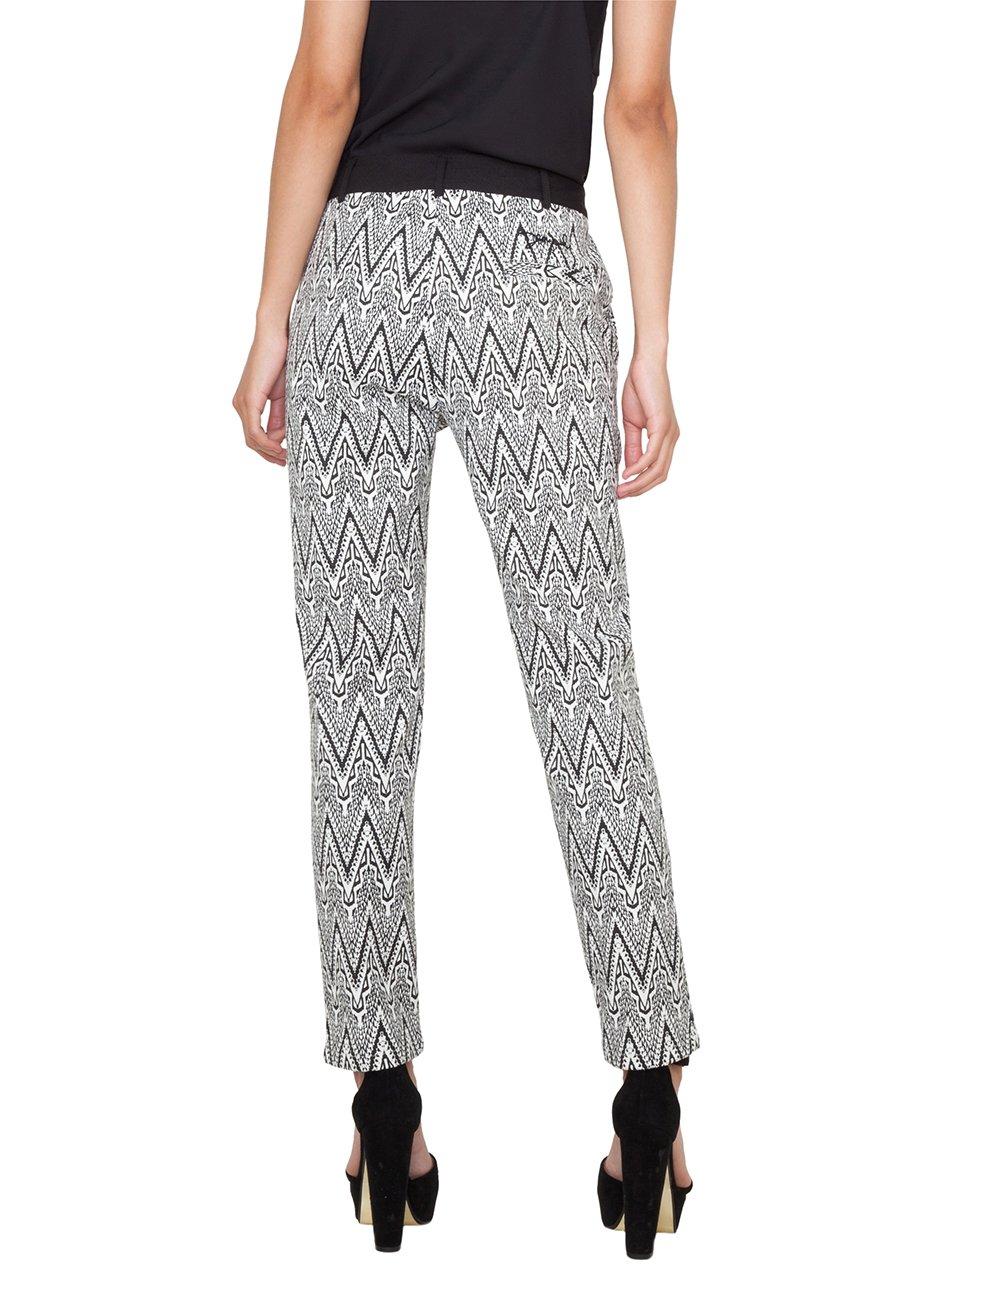 Desigual Pant_aroa Pantalones para Mujer